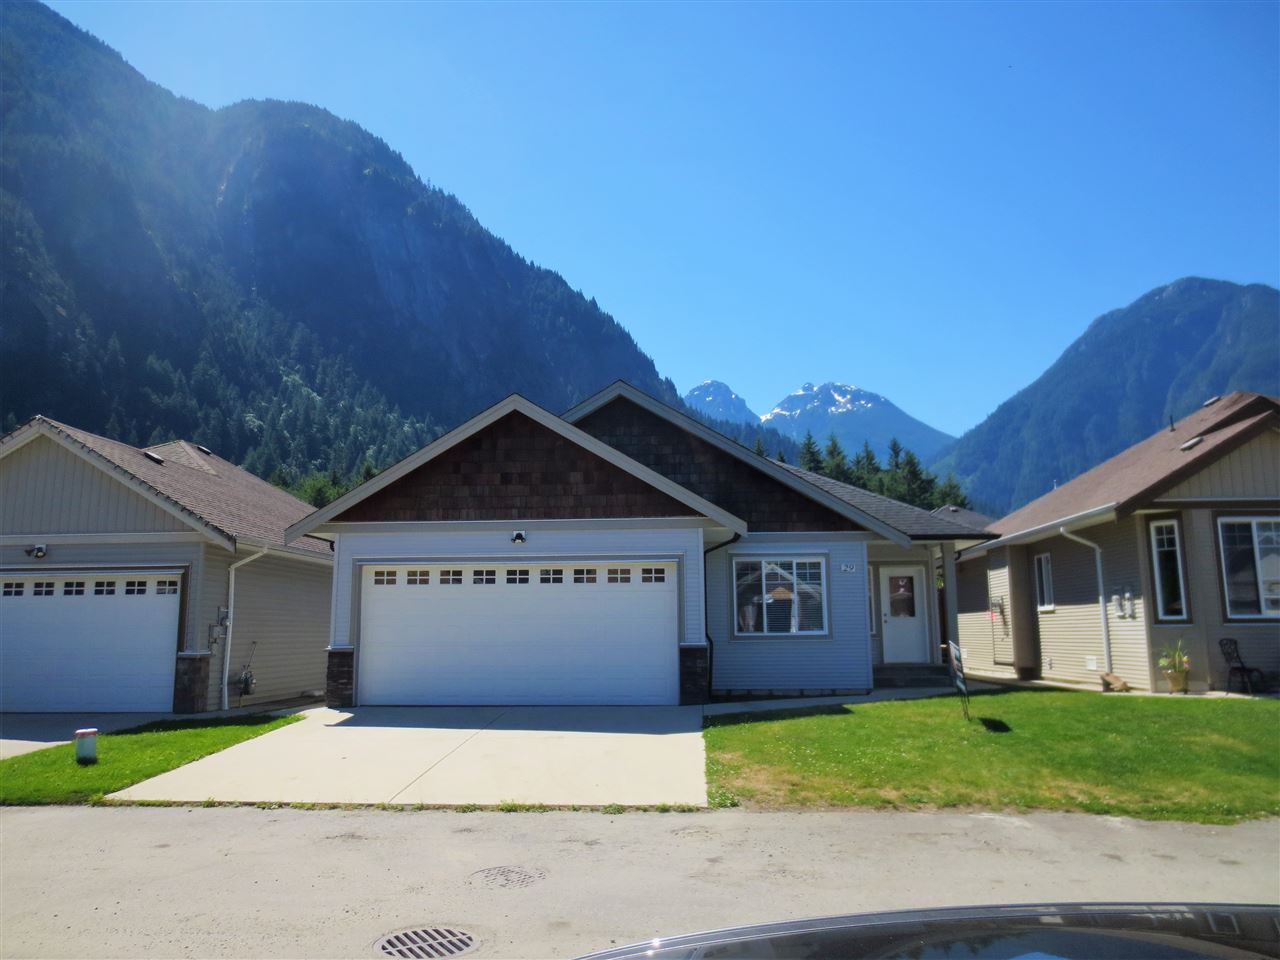 Detached at 29 20118 BEACON ROAD, Unit 29, Hope, British Columbia. Image 1